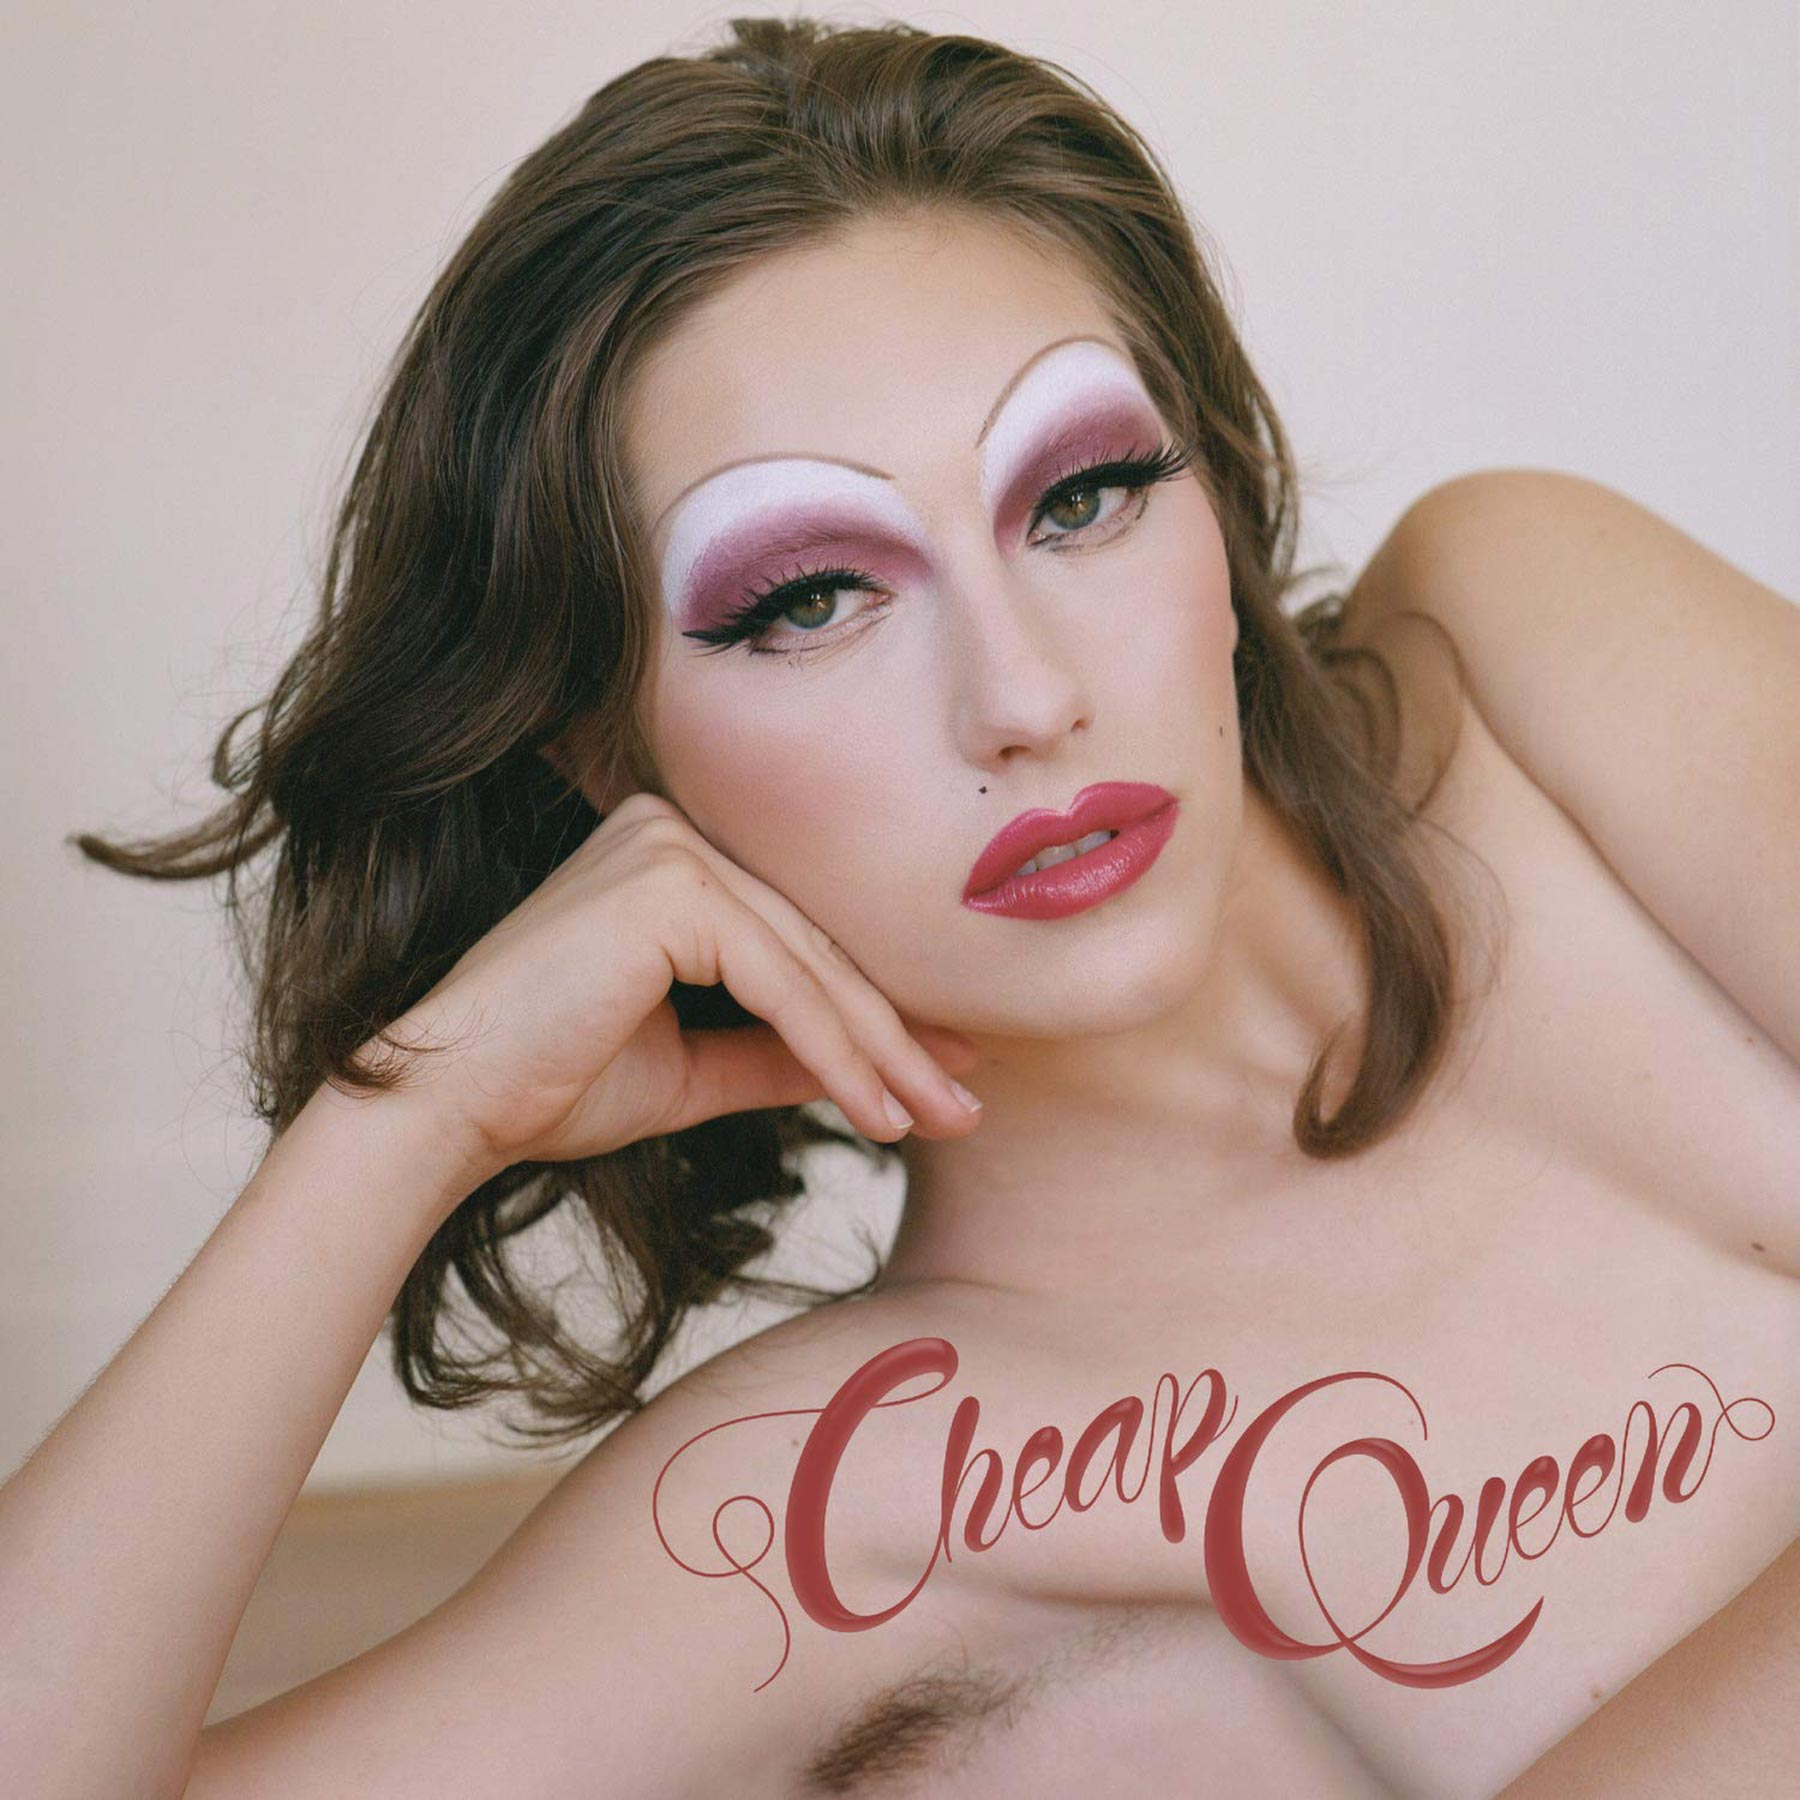 Cheap Queen by King Princess